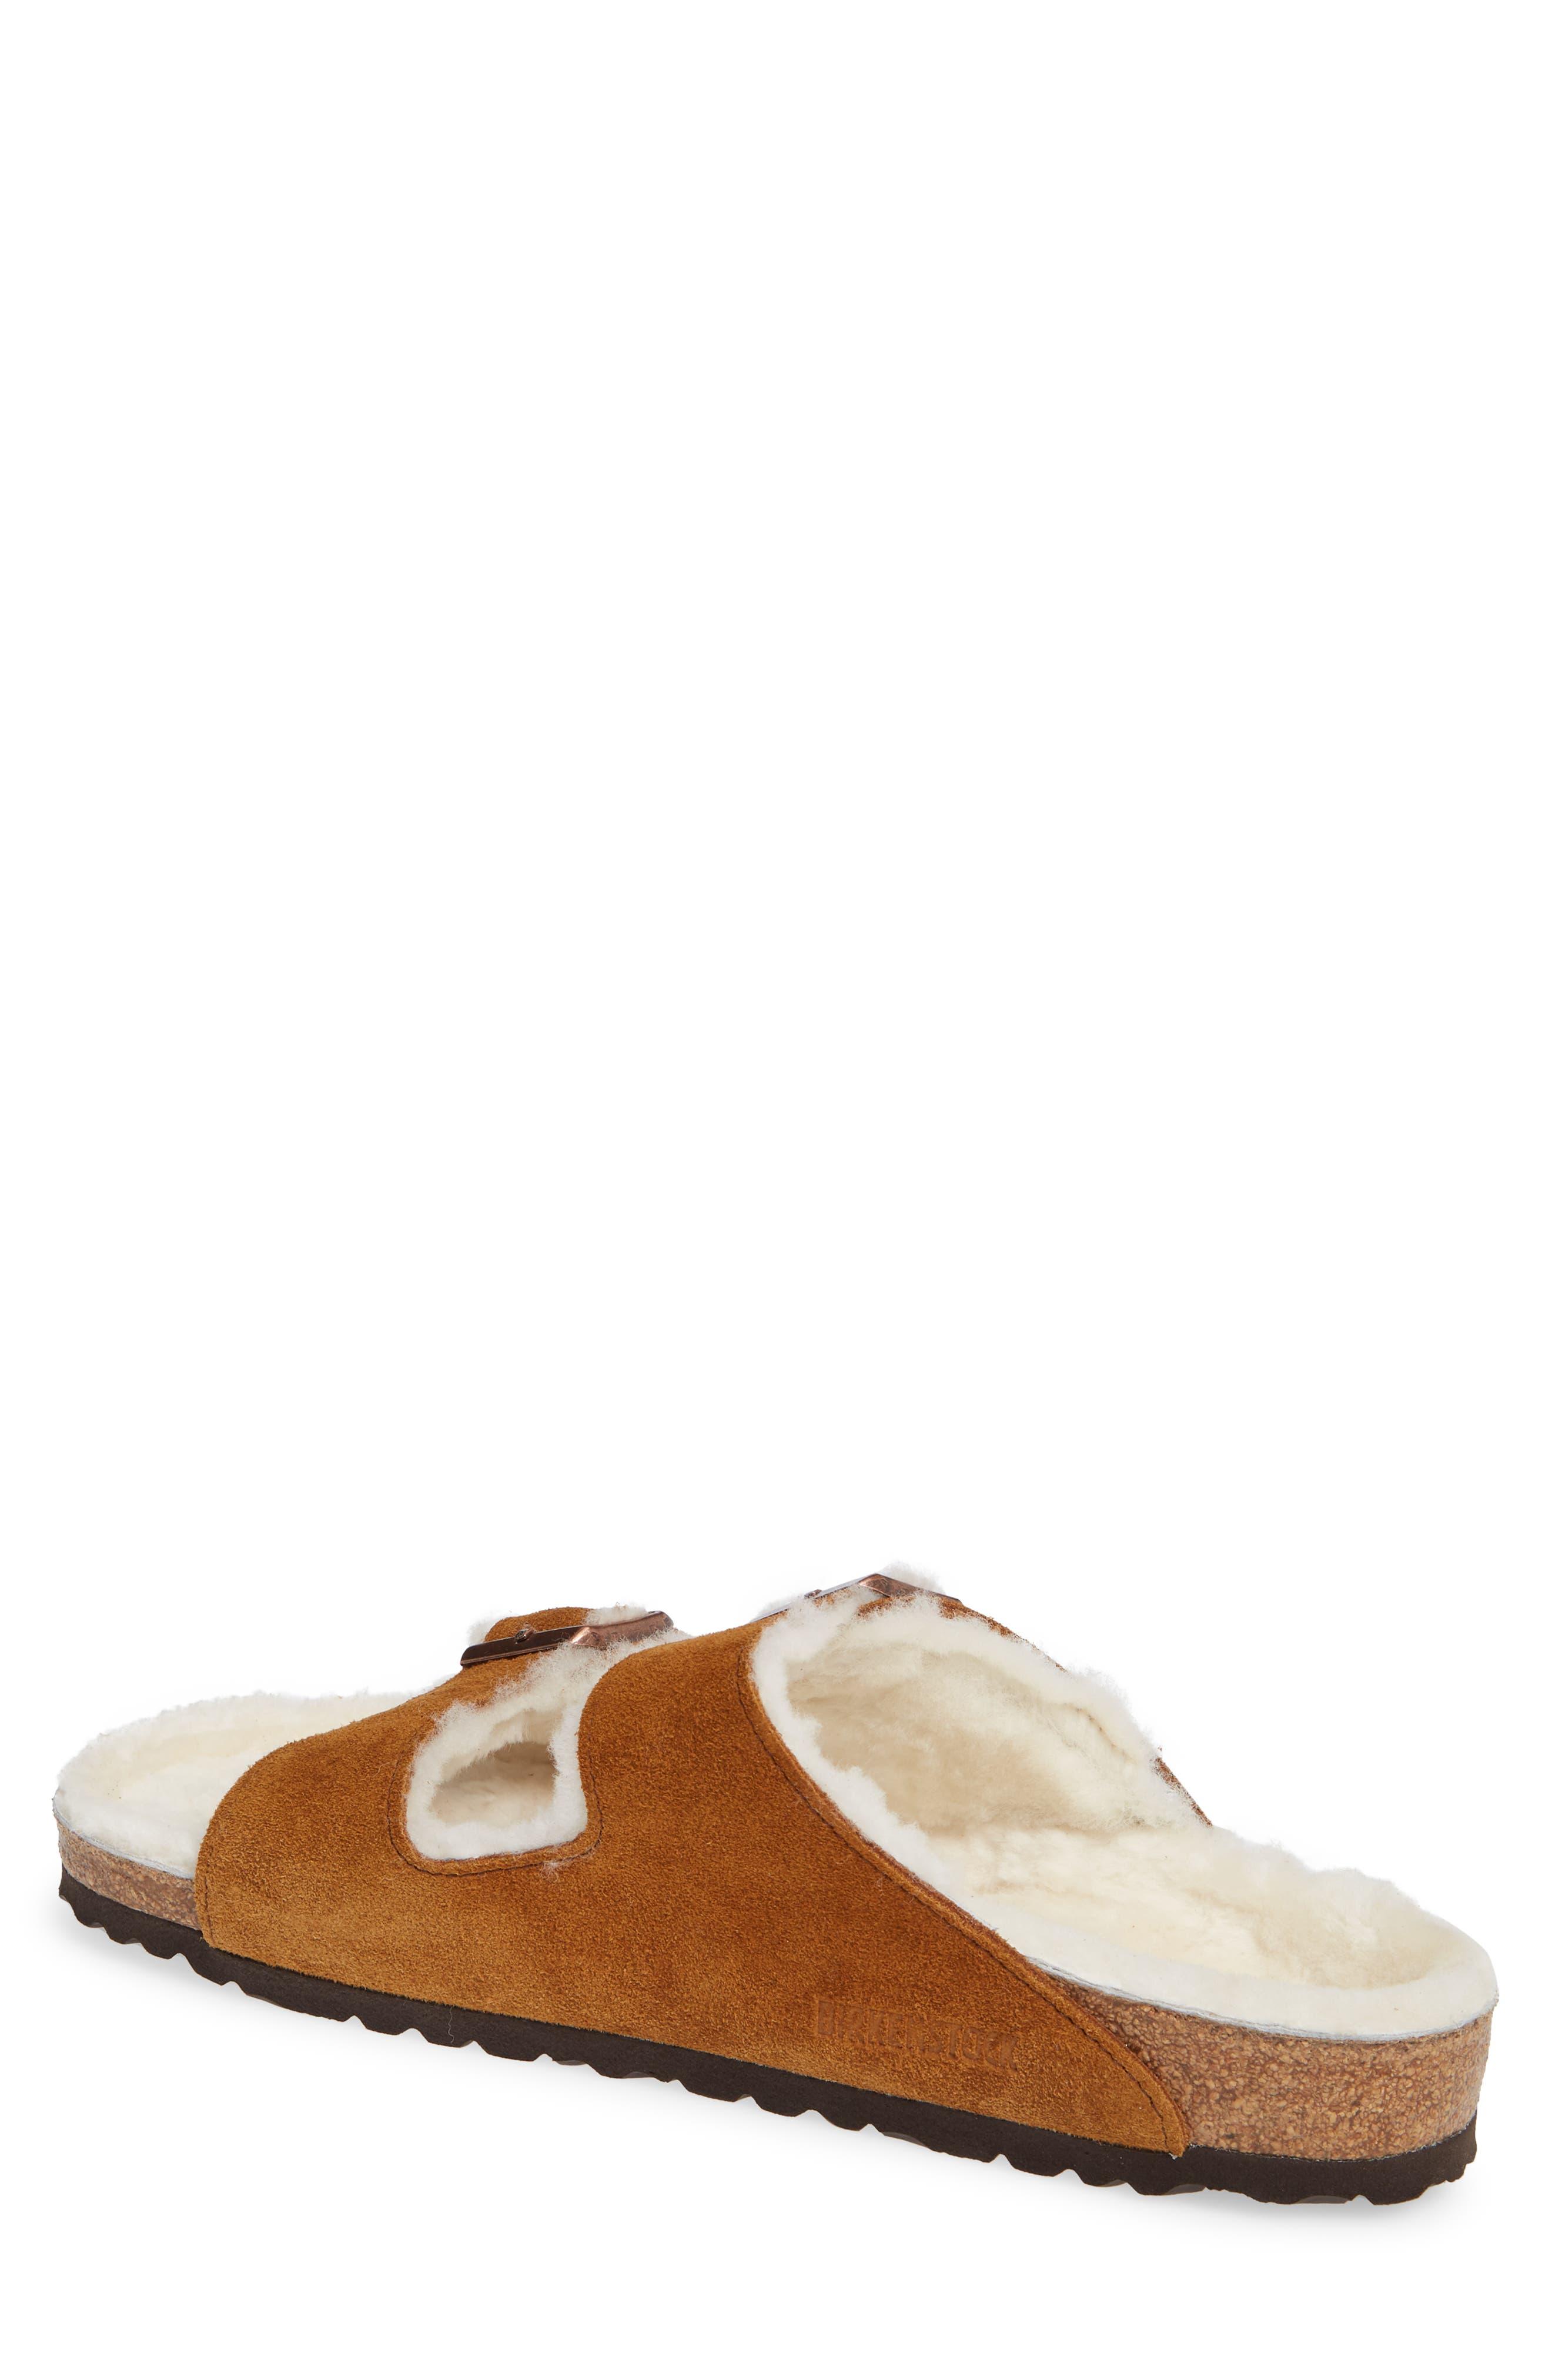 Arizona Slide Sandal with Genuine Shearling,                             Alternate thumbnail 2, color,                             BEIGE